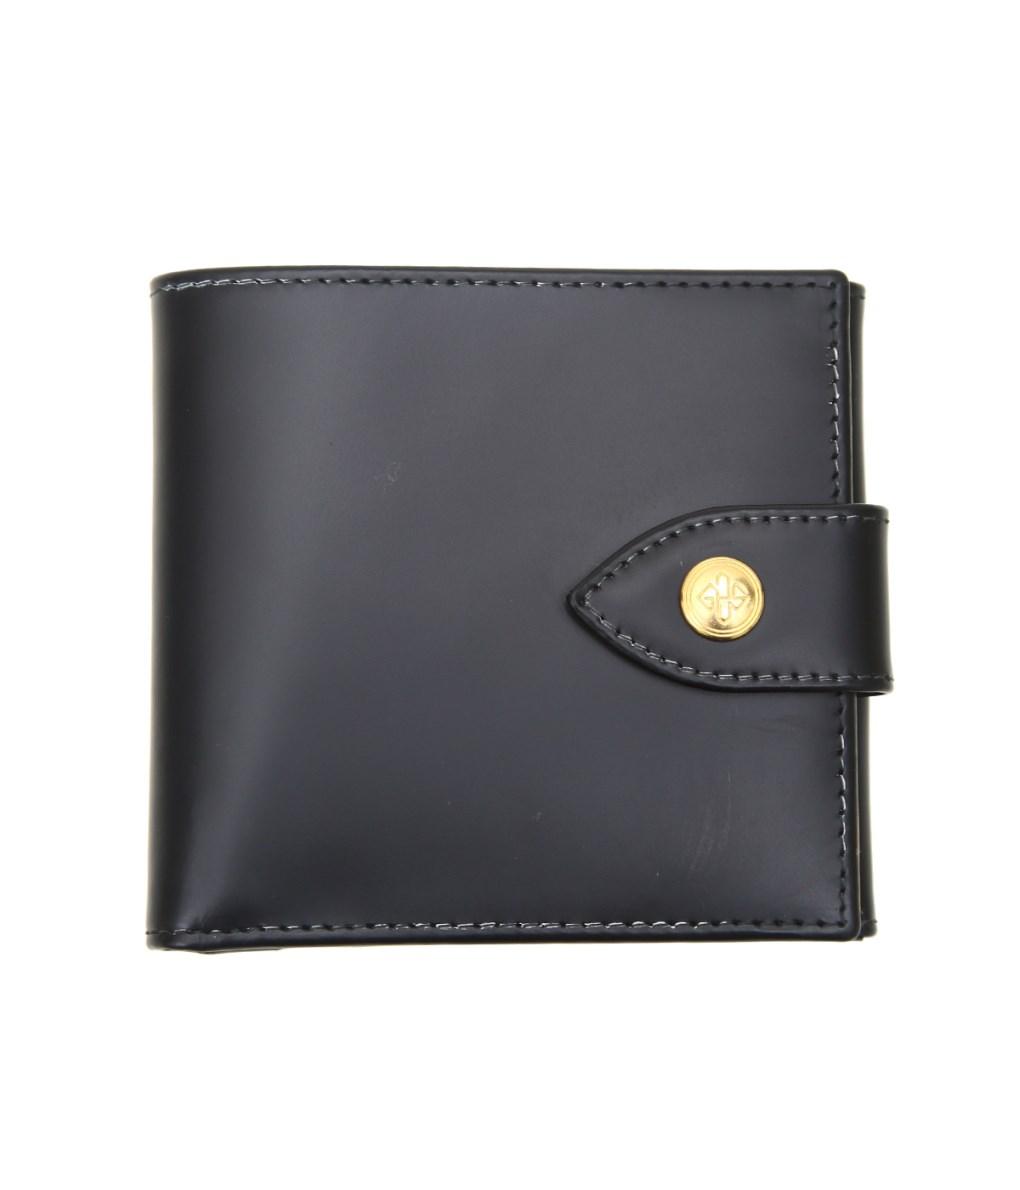 ETTINGER / エッティンガー : Tab Wallet w. 10 C/C+Purse / 全2色 : エッティンガー レザー 本革 タブウォレット 財布 定番 : BH951AJR 【MUS】